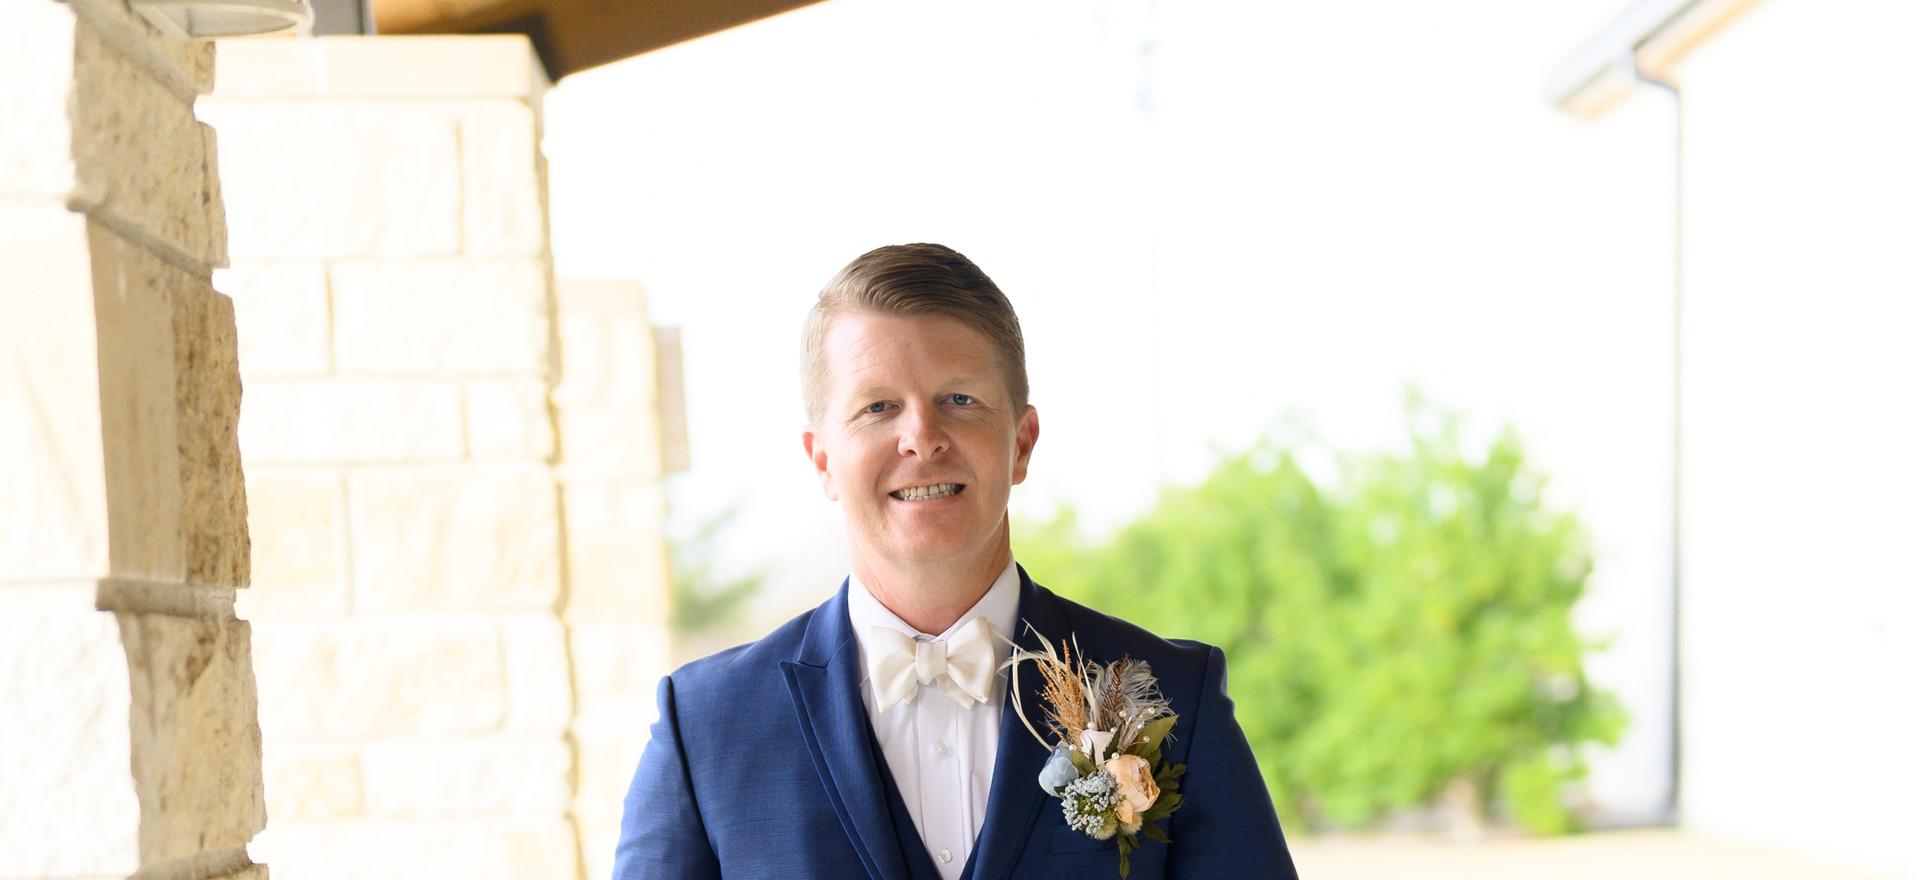 033_Lorena and Mike's Wedding day.jpg